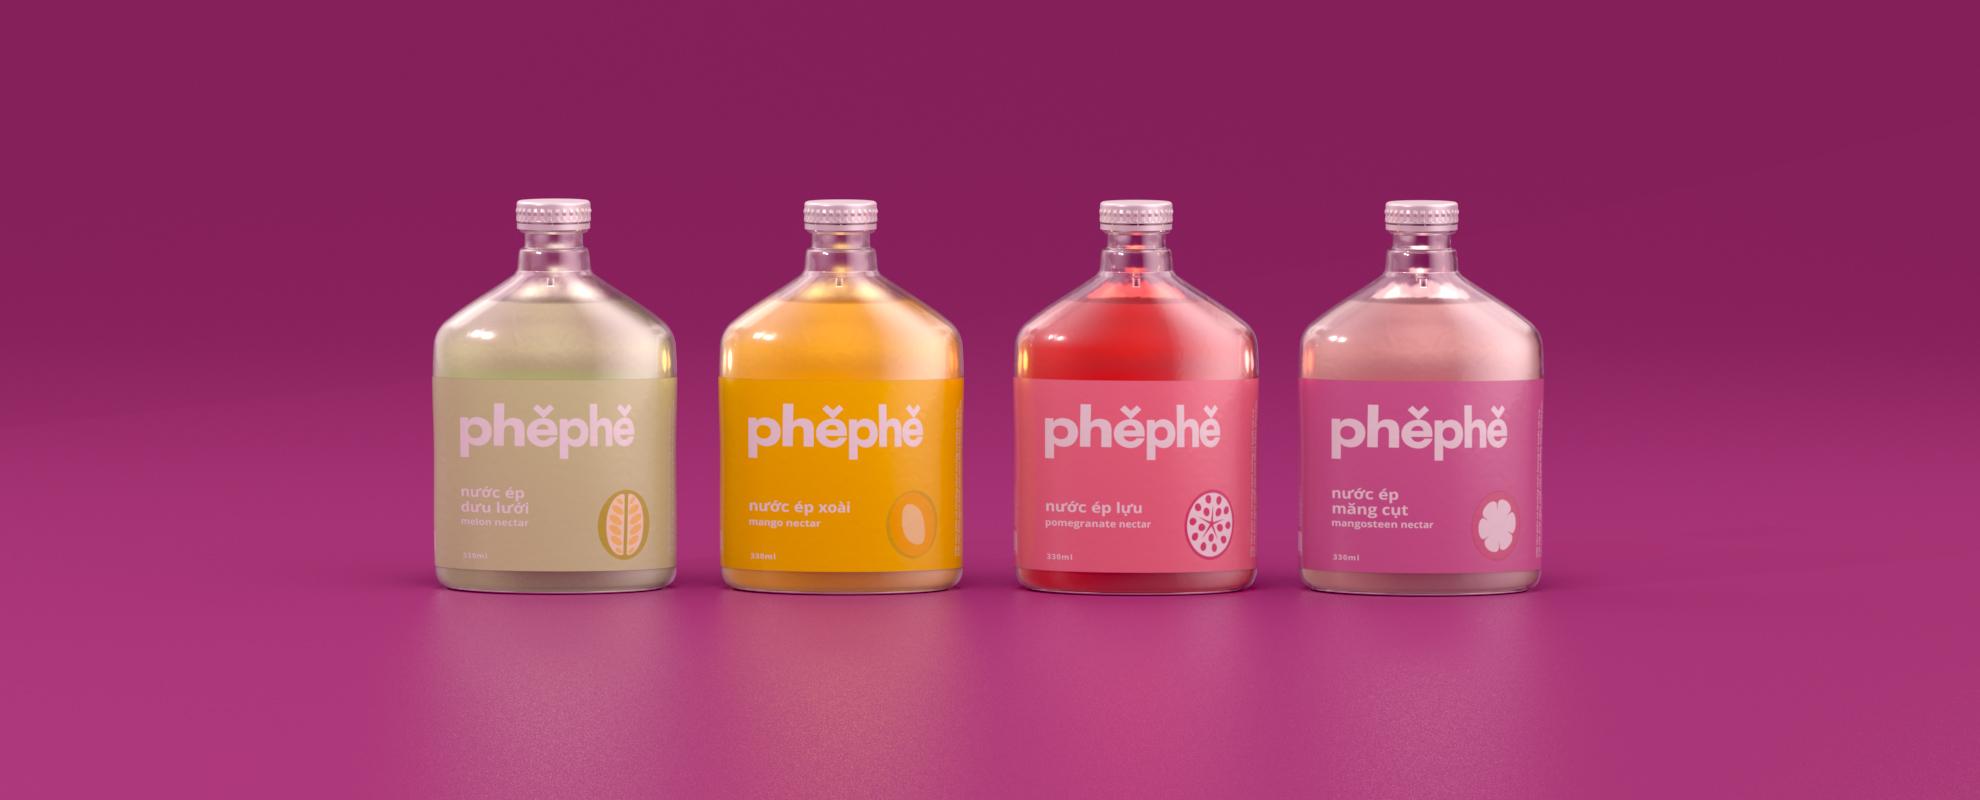 thiet ke san pham, bao bi san pham, label design, packaging design, branding, product design, juice bottle, phephe, xolve branding, modern design, mockup, dark and moody